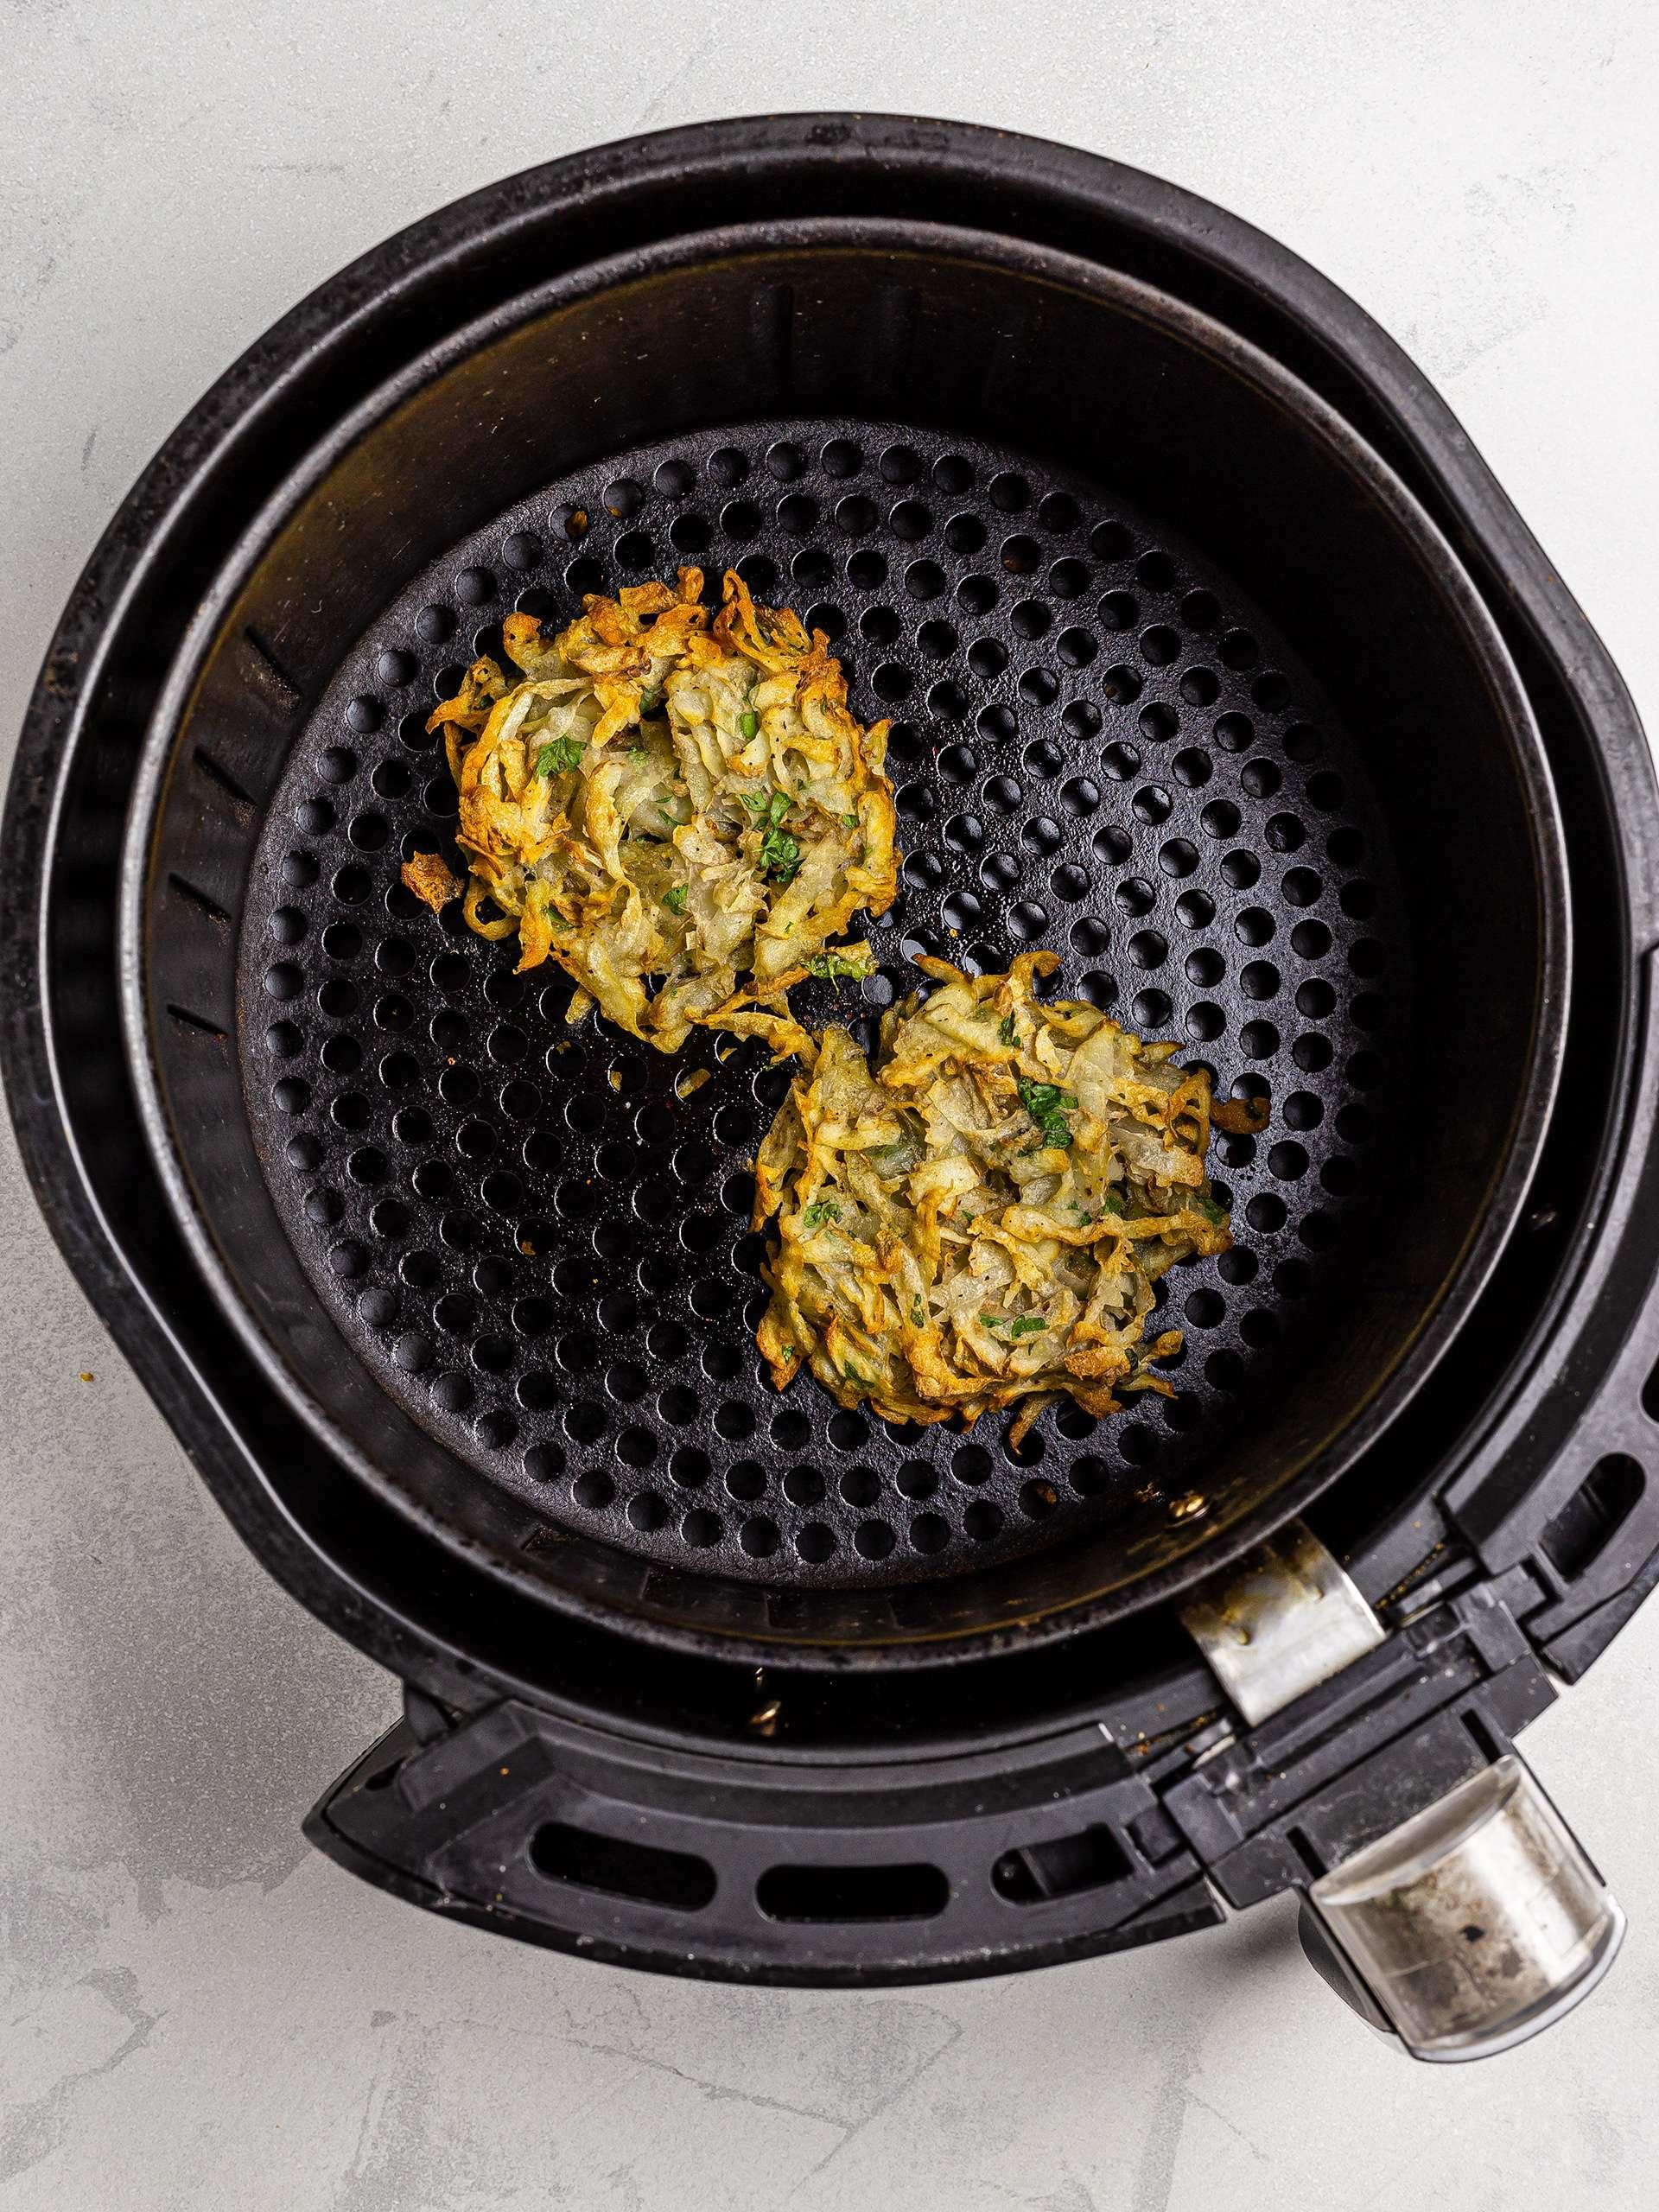 Hash browns in the air-fryer basket